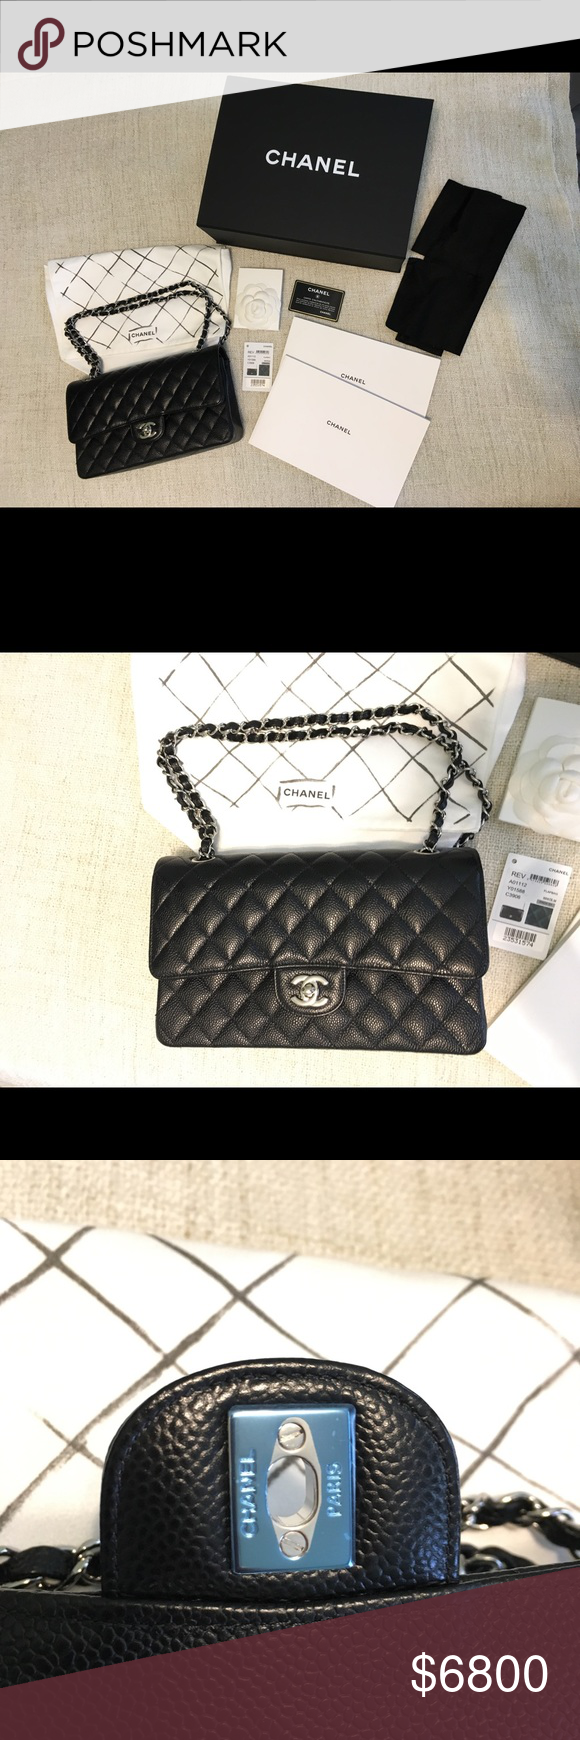 685ed5e696ff Chanel Medium/Large Classic Flap Black Caviar SHW Authentic Chanel Classic  Flap Medium / Large